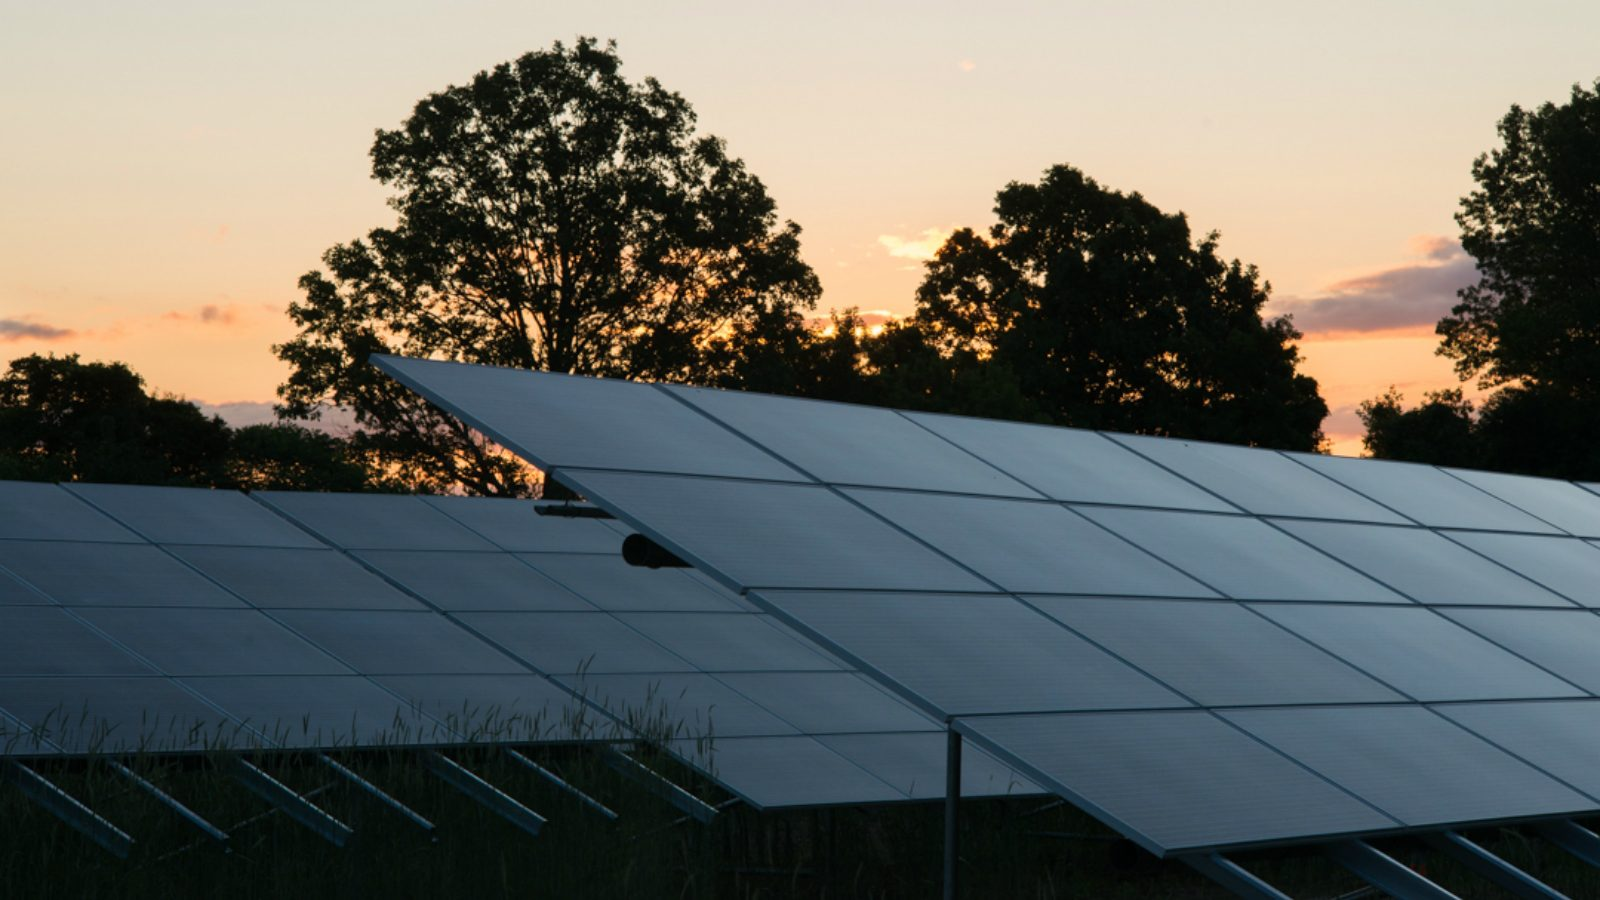 The Hilltowns' first solar farm nears approval